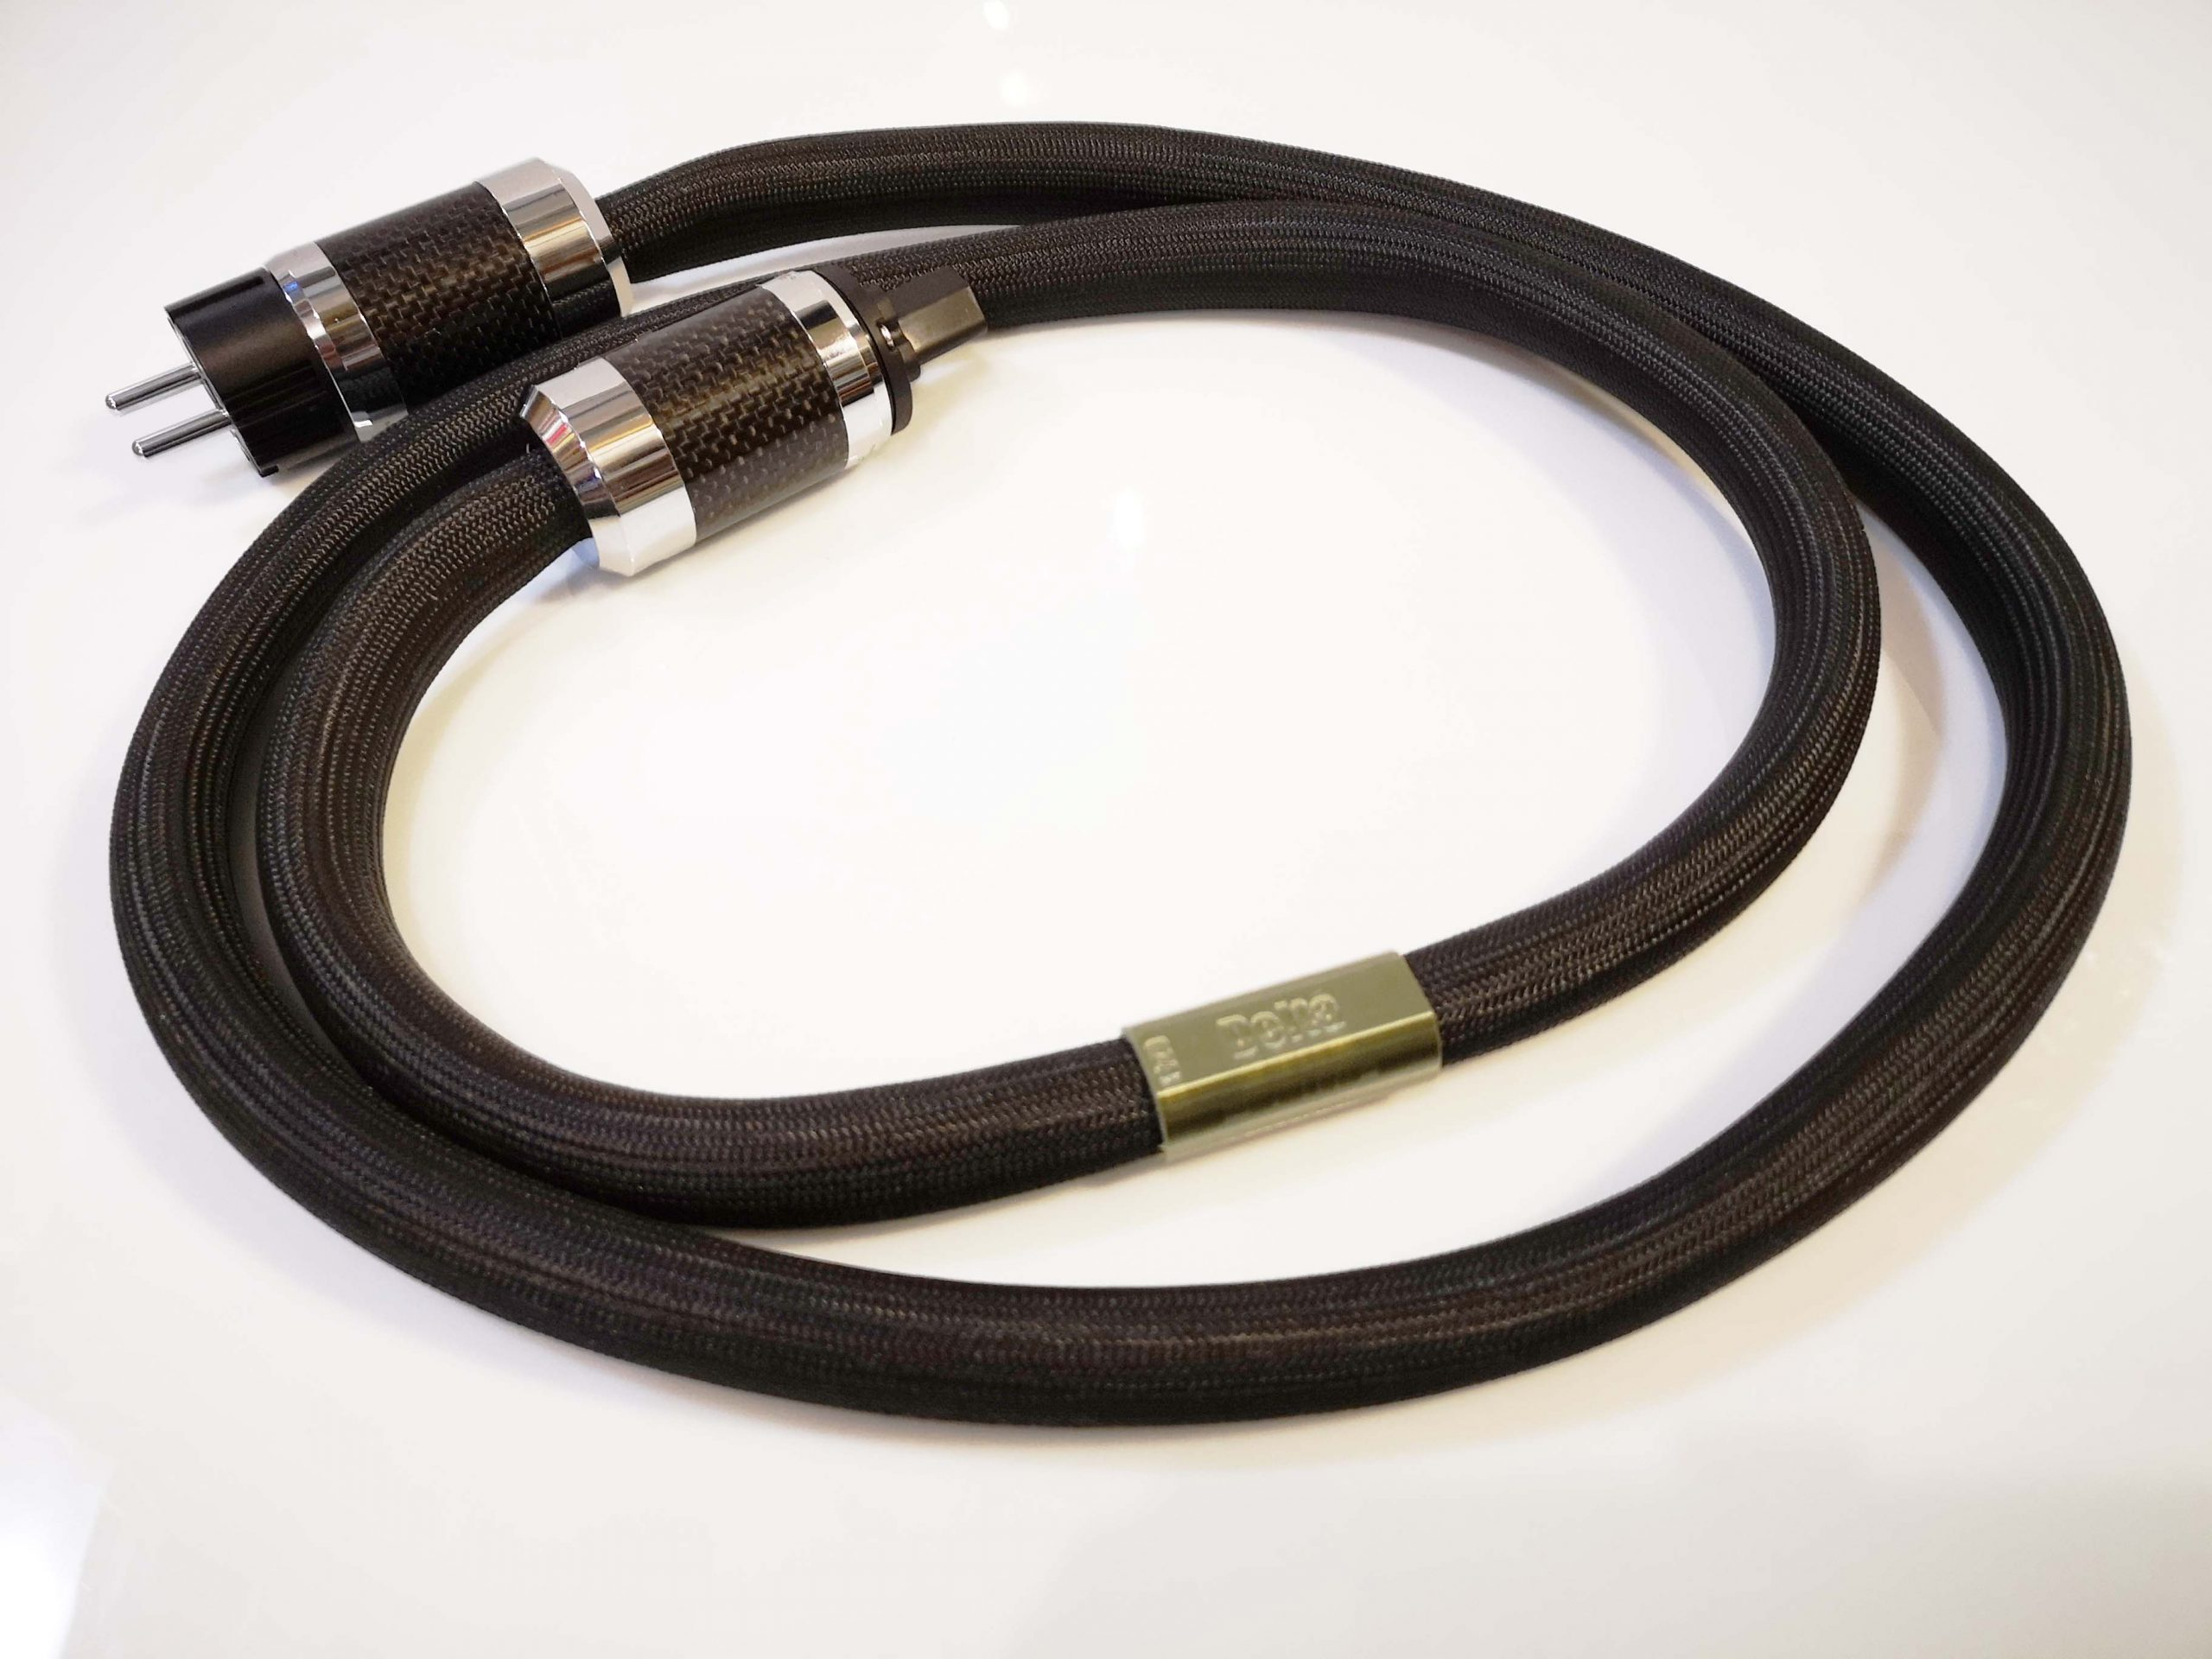 Delta Secteur Schuko Power Odeion Cables